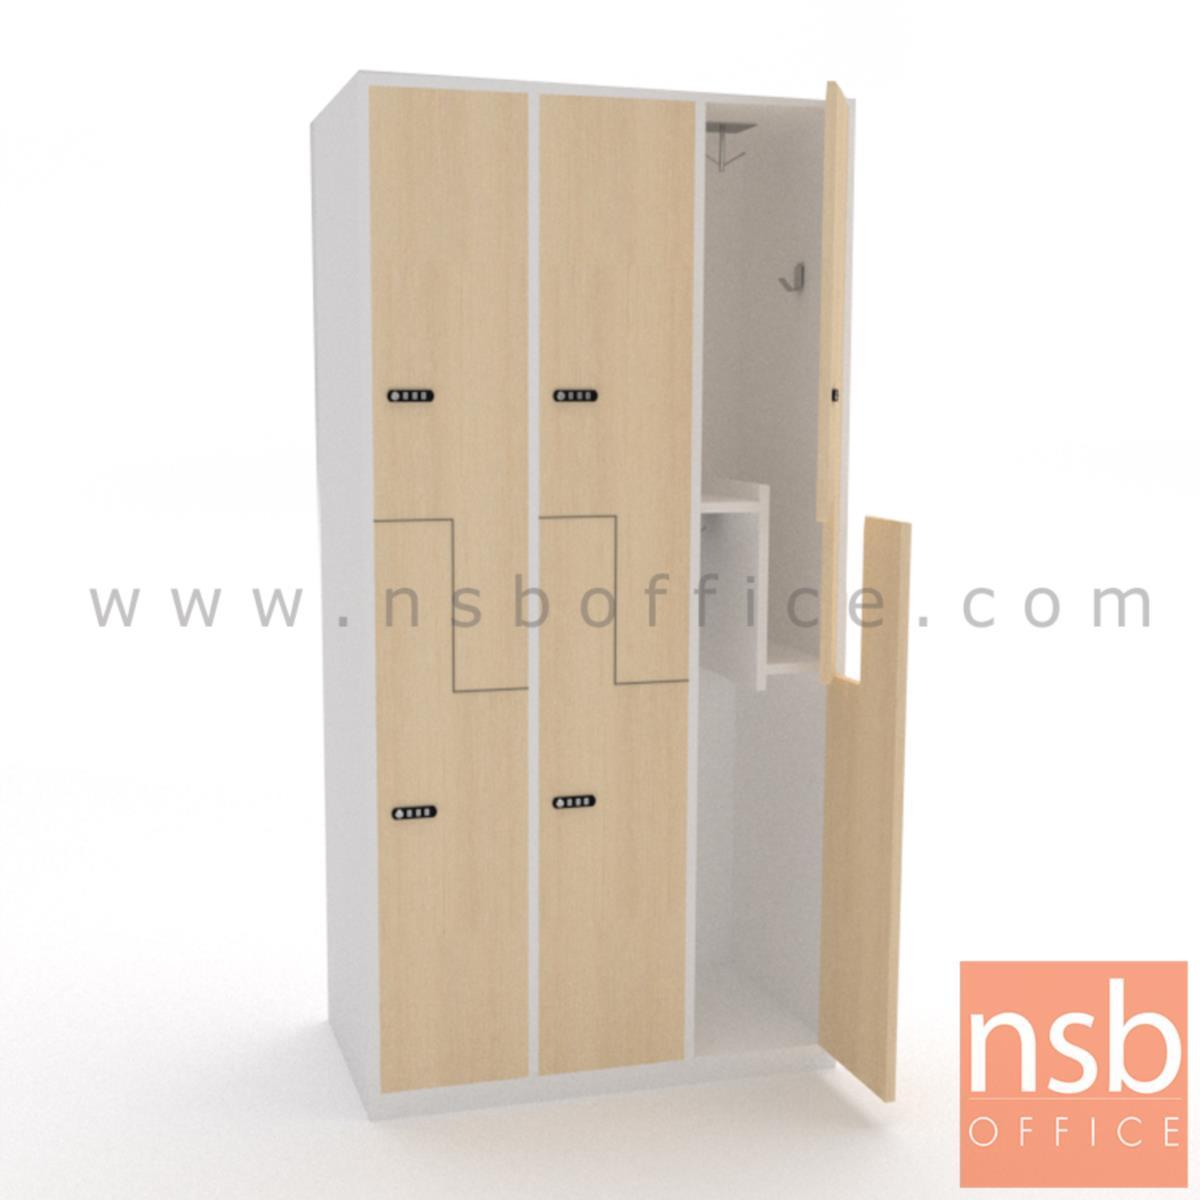 C13A012:ตู้ล็อกเกอร์ 6 ประตู มีราวแขวนเสื้อ รุ่น Medhub